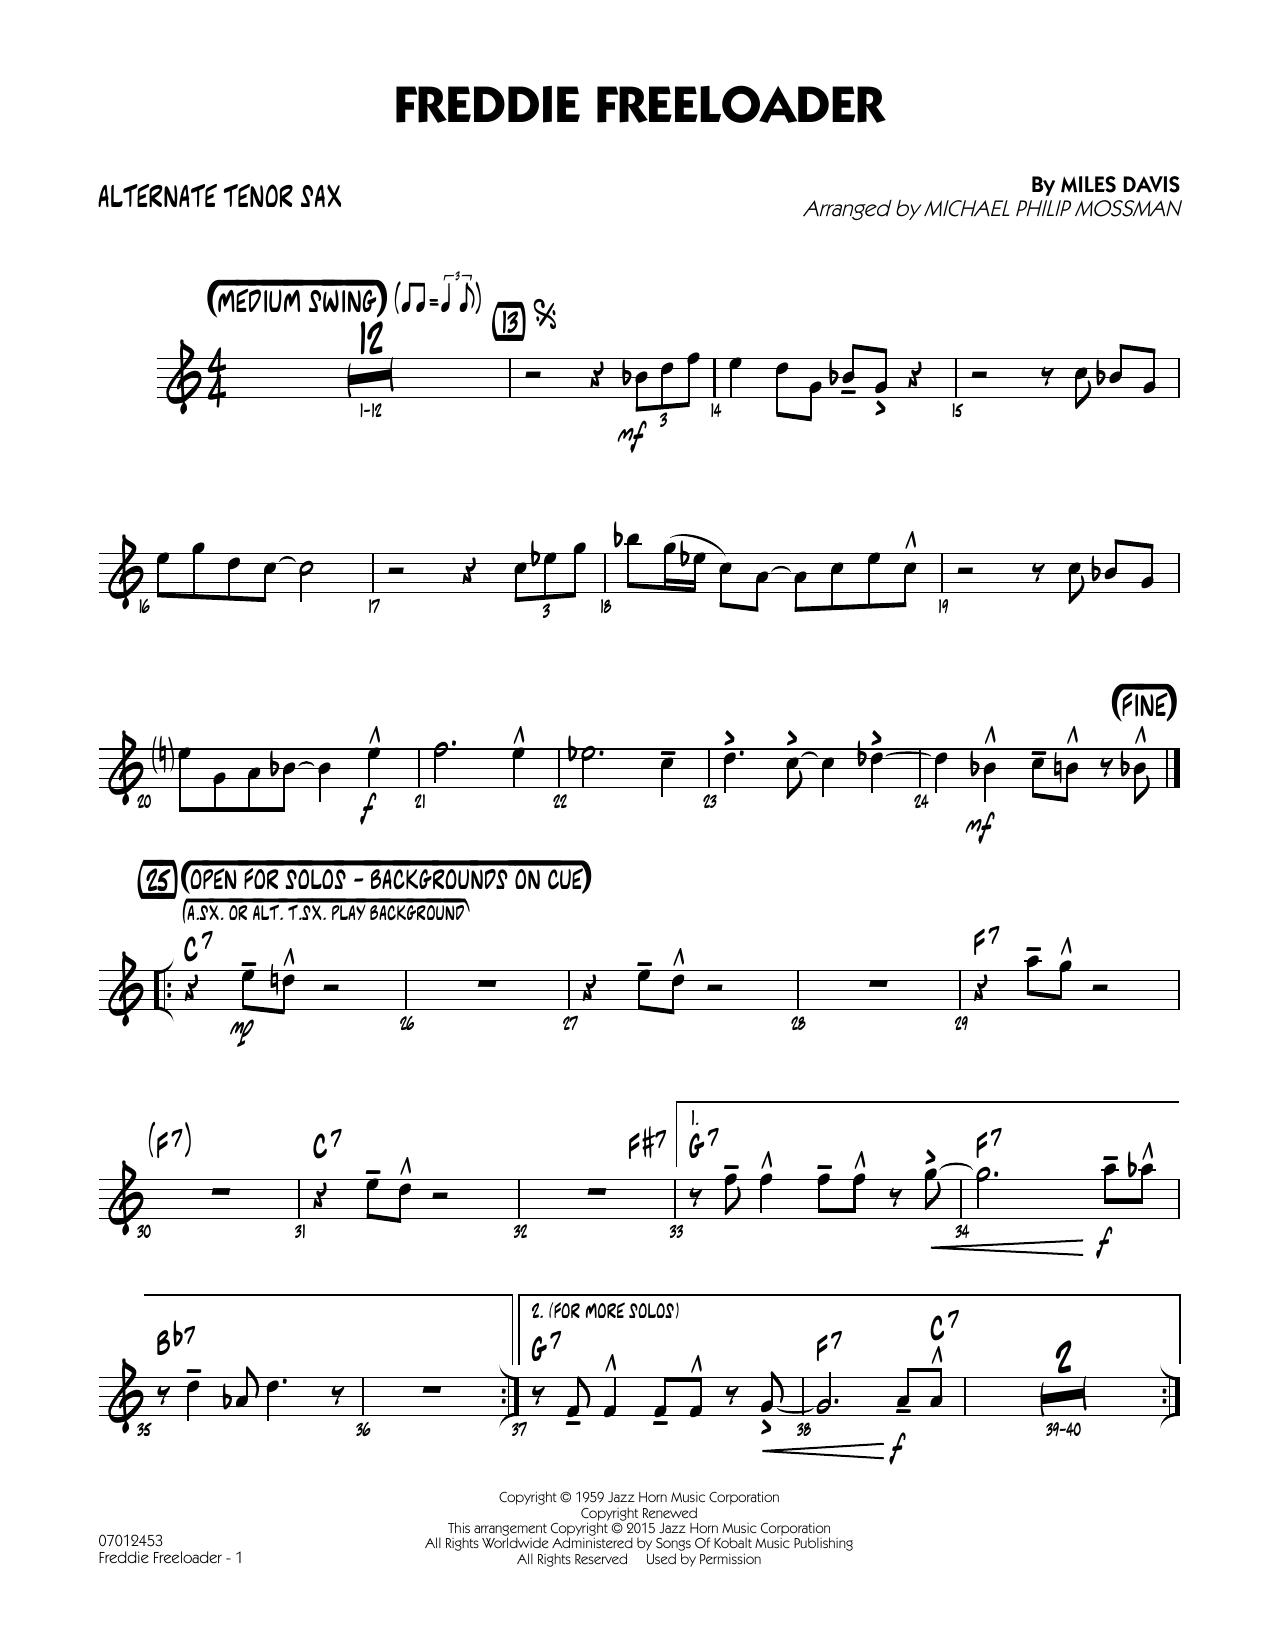 Freddie Freeloader - Alternate Tenor Sax by Michael Philip Mossman Jazz  Ensemble Digital Sheet Music